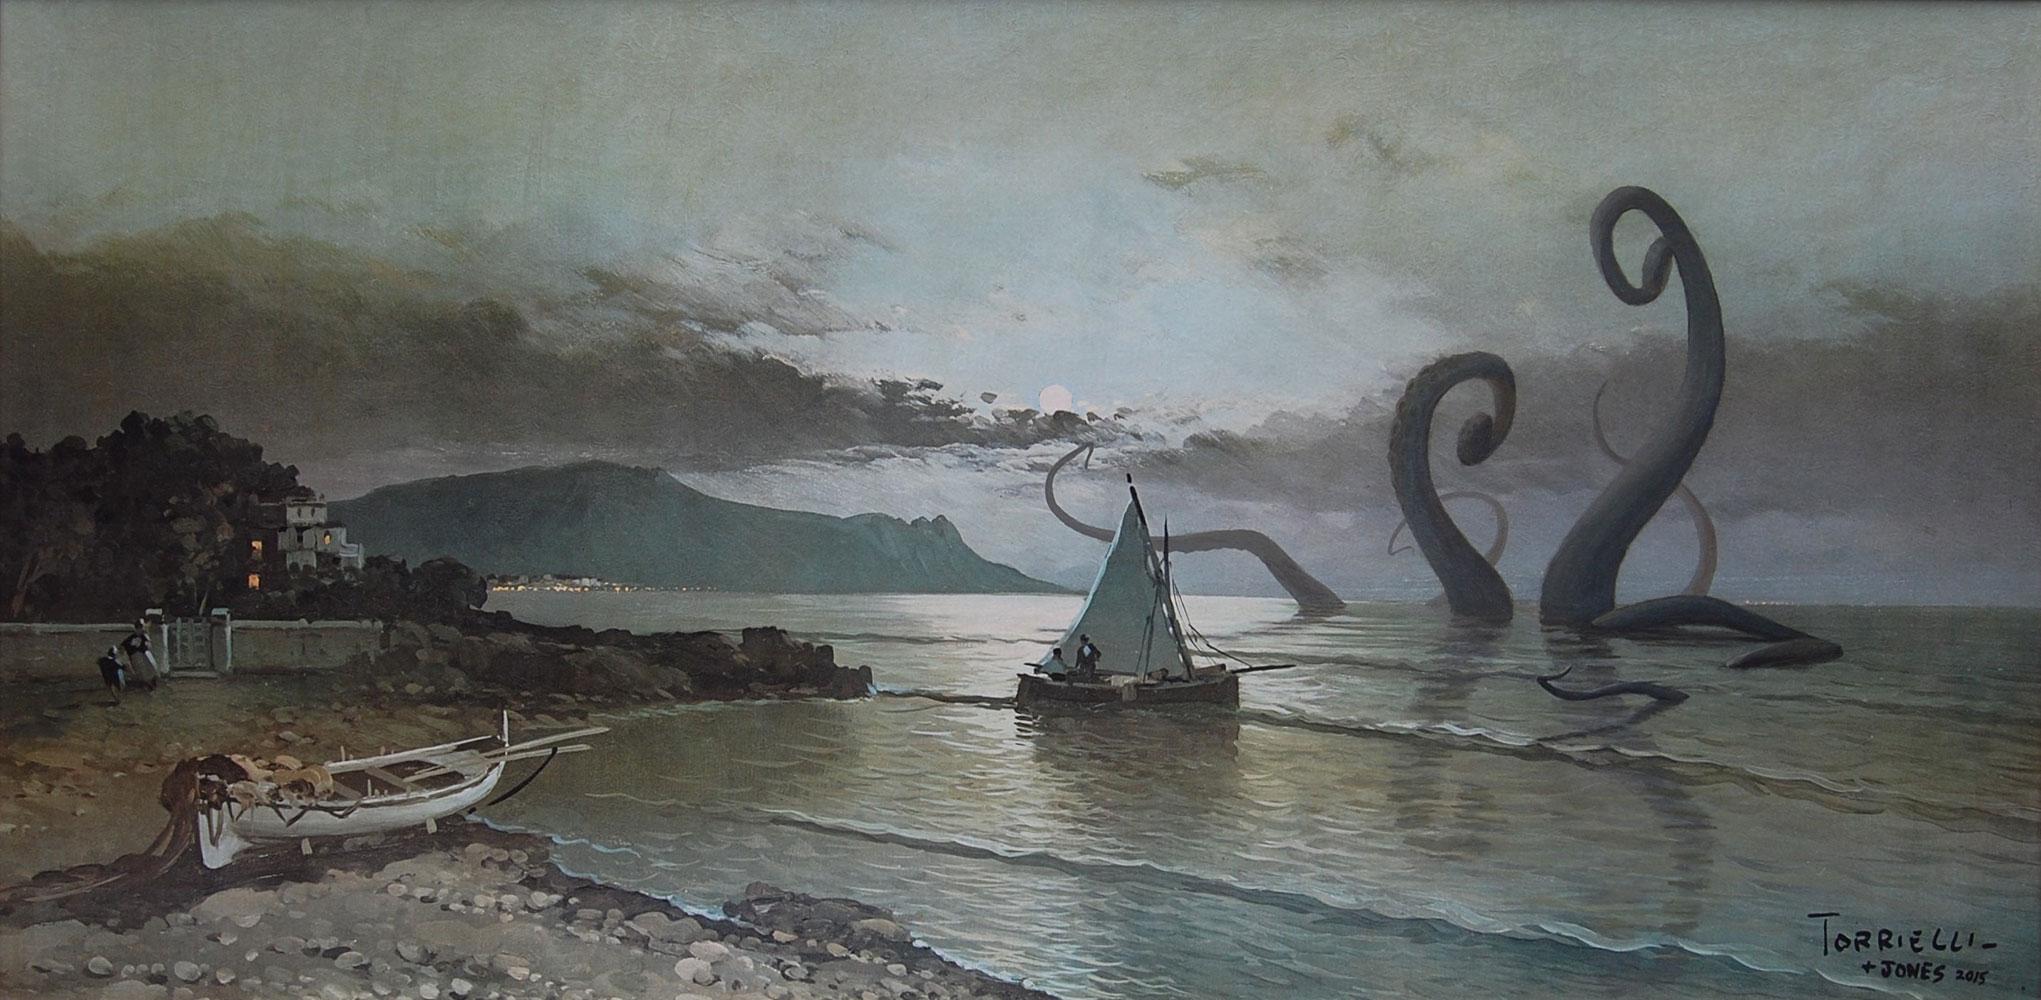 Jason Jones, Kraken